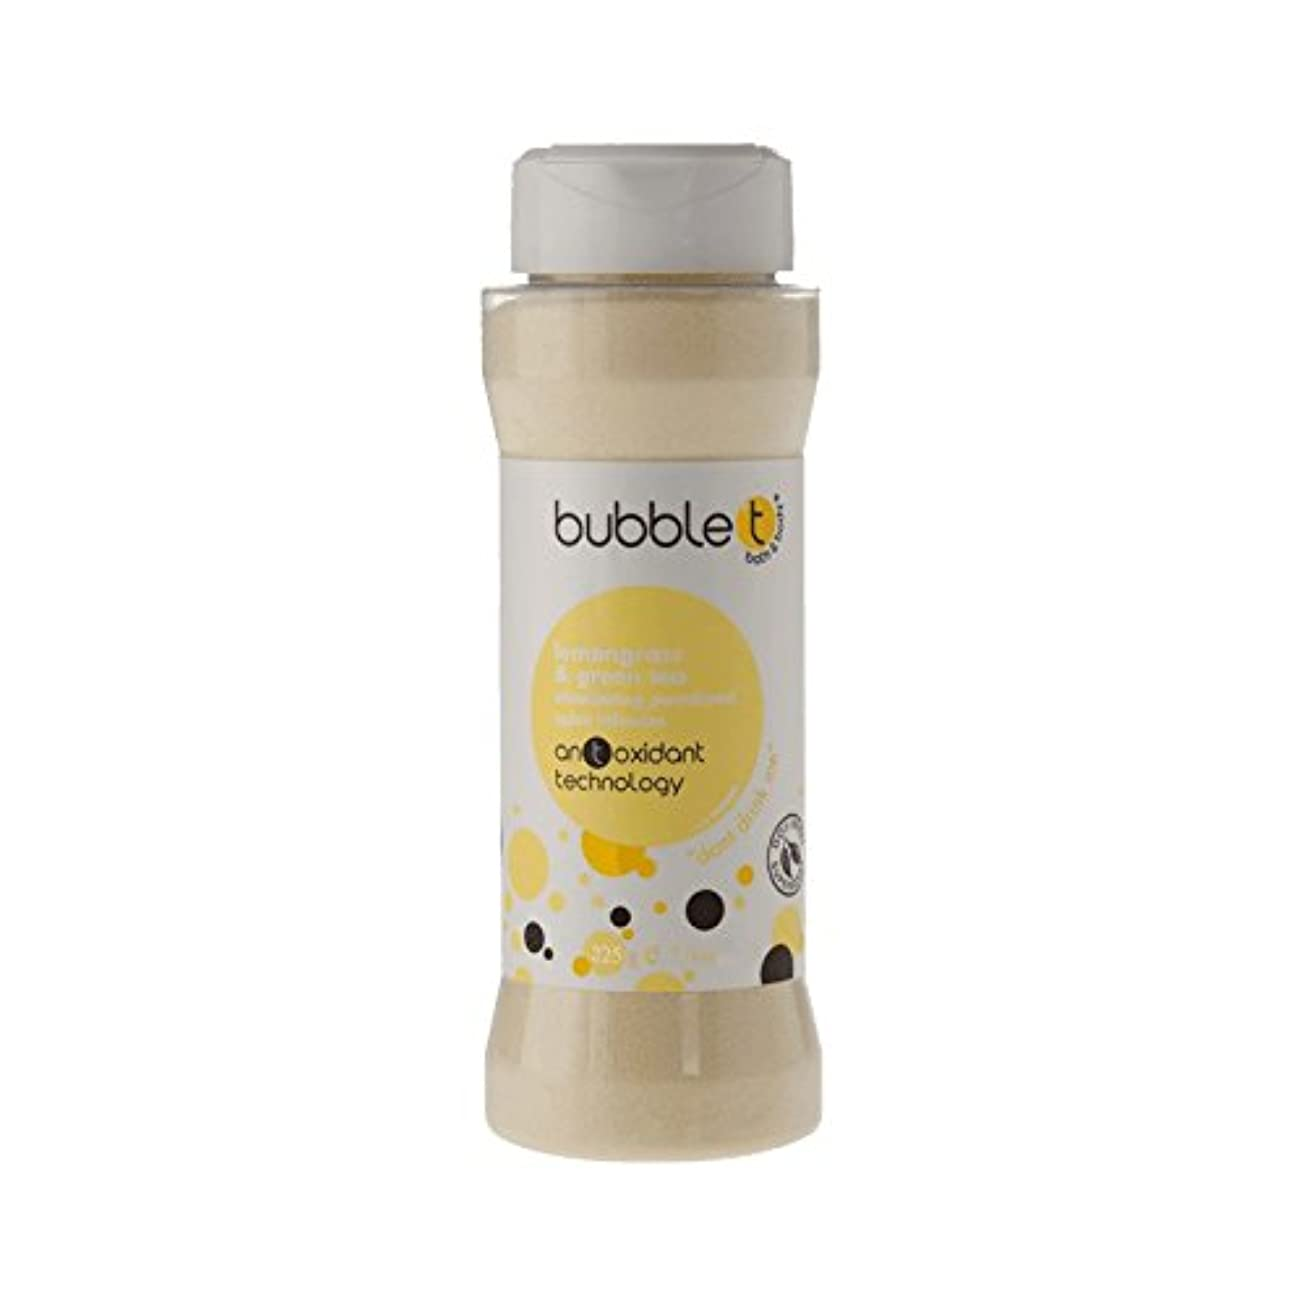 Bubble T Bath Spice Infusion Lemongrass & Green Tea 225g (Pack of 6) - バブルトン風呂スパイス注入レモングラス&緑茶225グラム (x6) [並行輸入品]